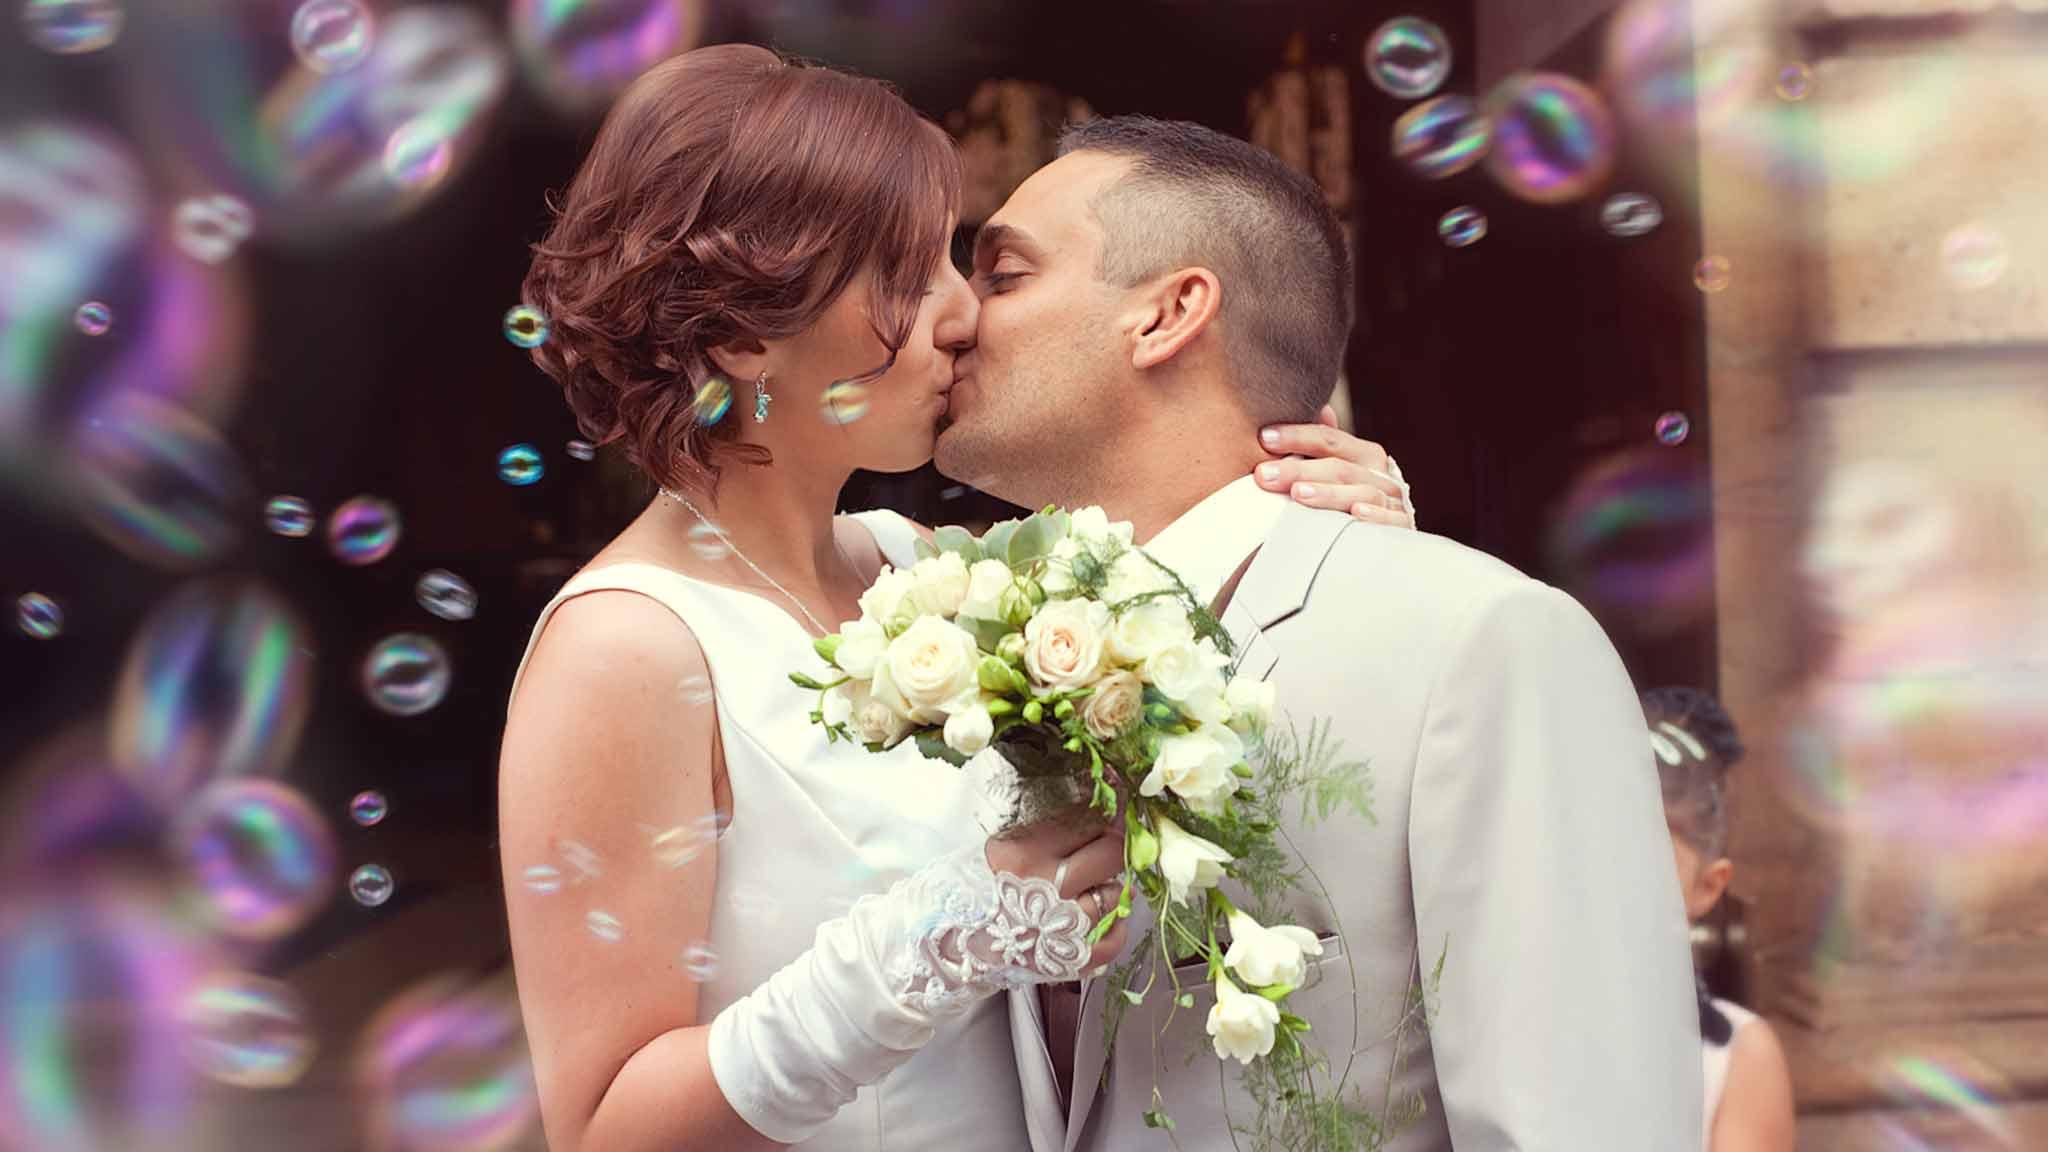 couple-mairie-bulles-baiser-photographe-mariage-wedding-photographer